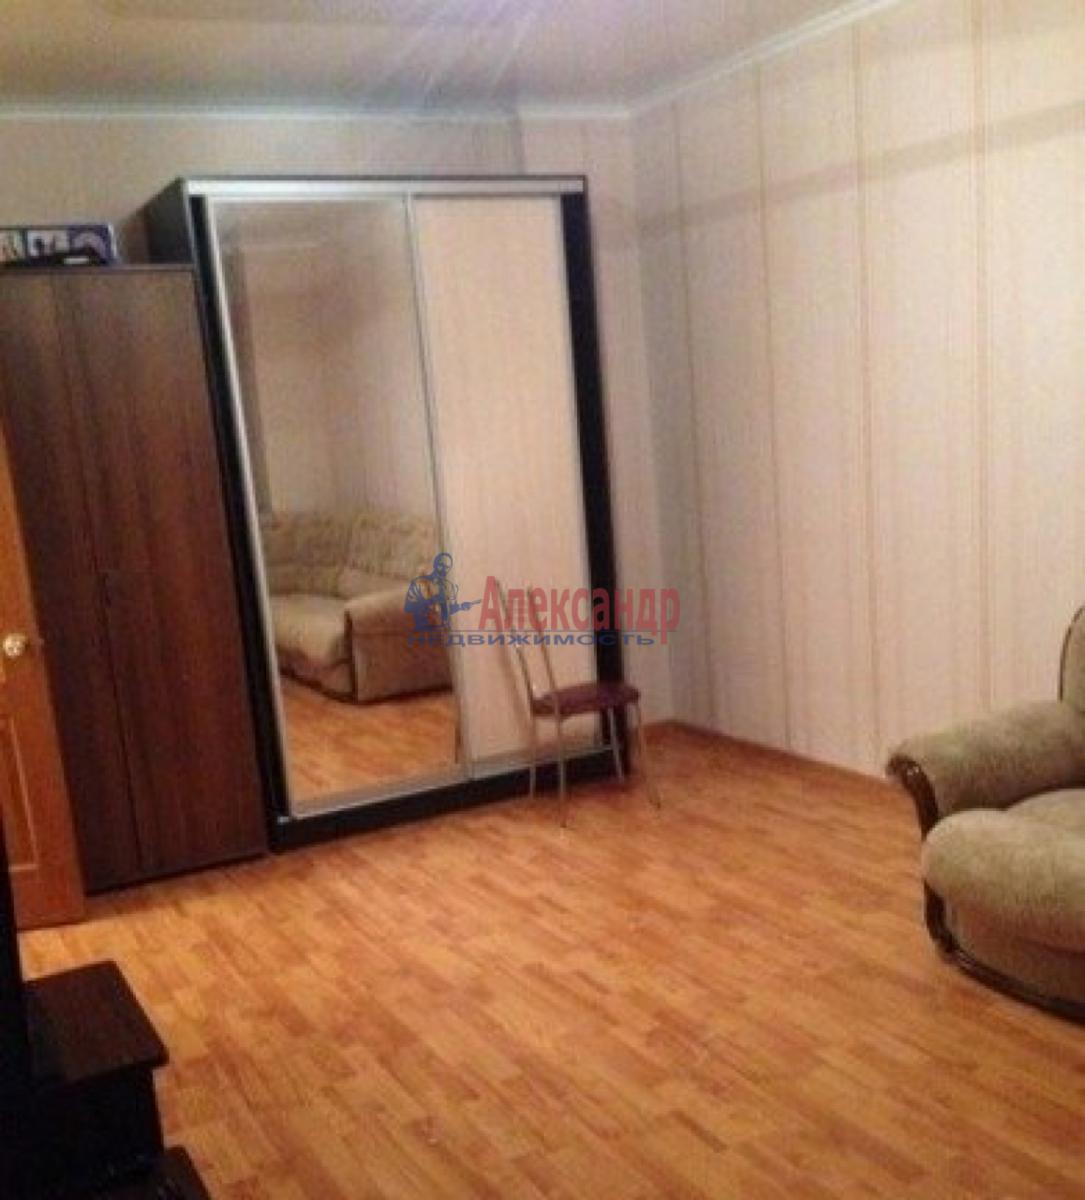 1-комнатная квартира (35м2) в аренду по адресу Старо-Петергофский пр., 28— фото 2 из 5